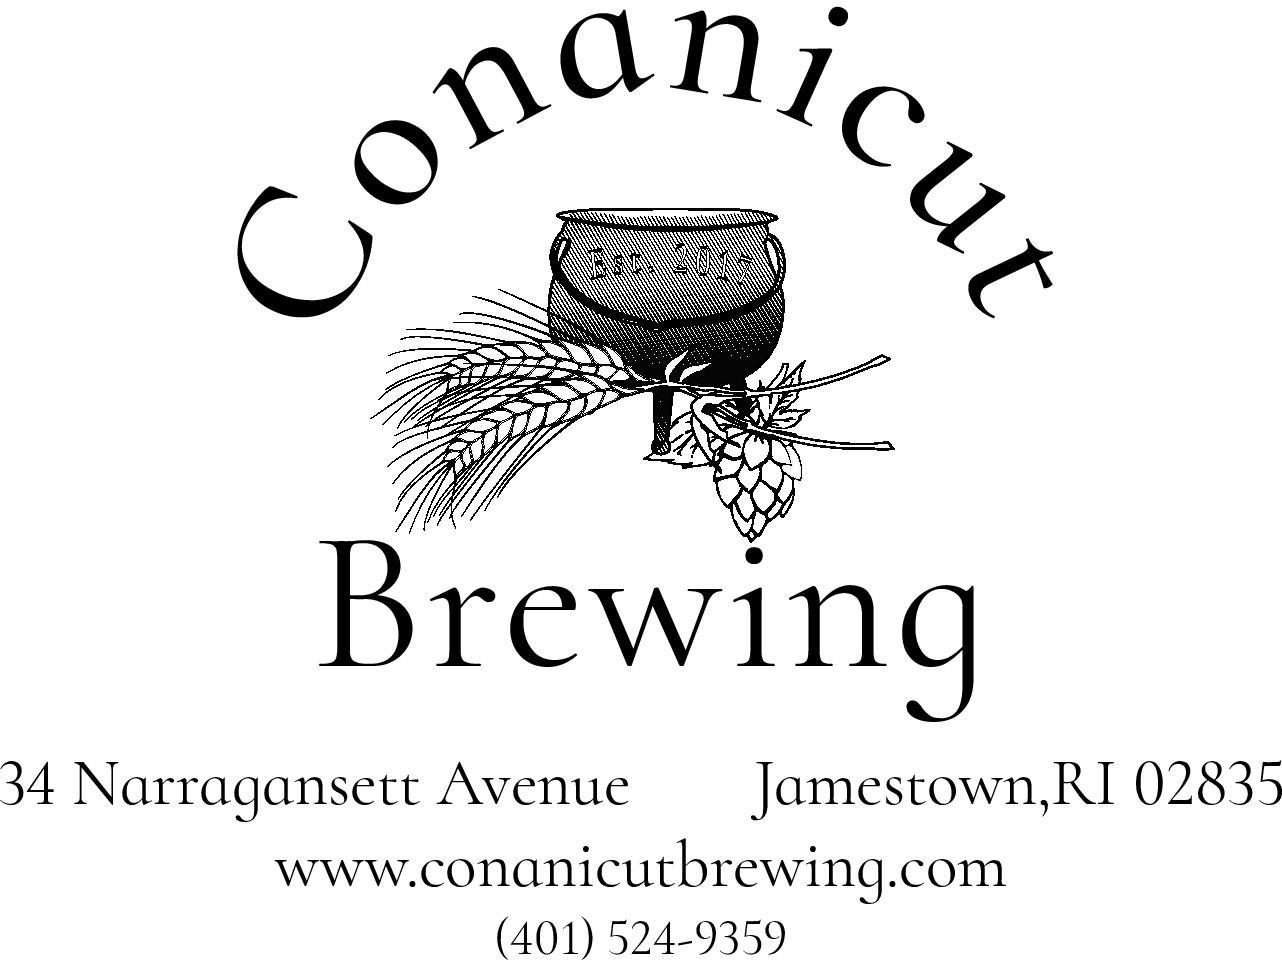 Conanicut Brewing